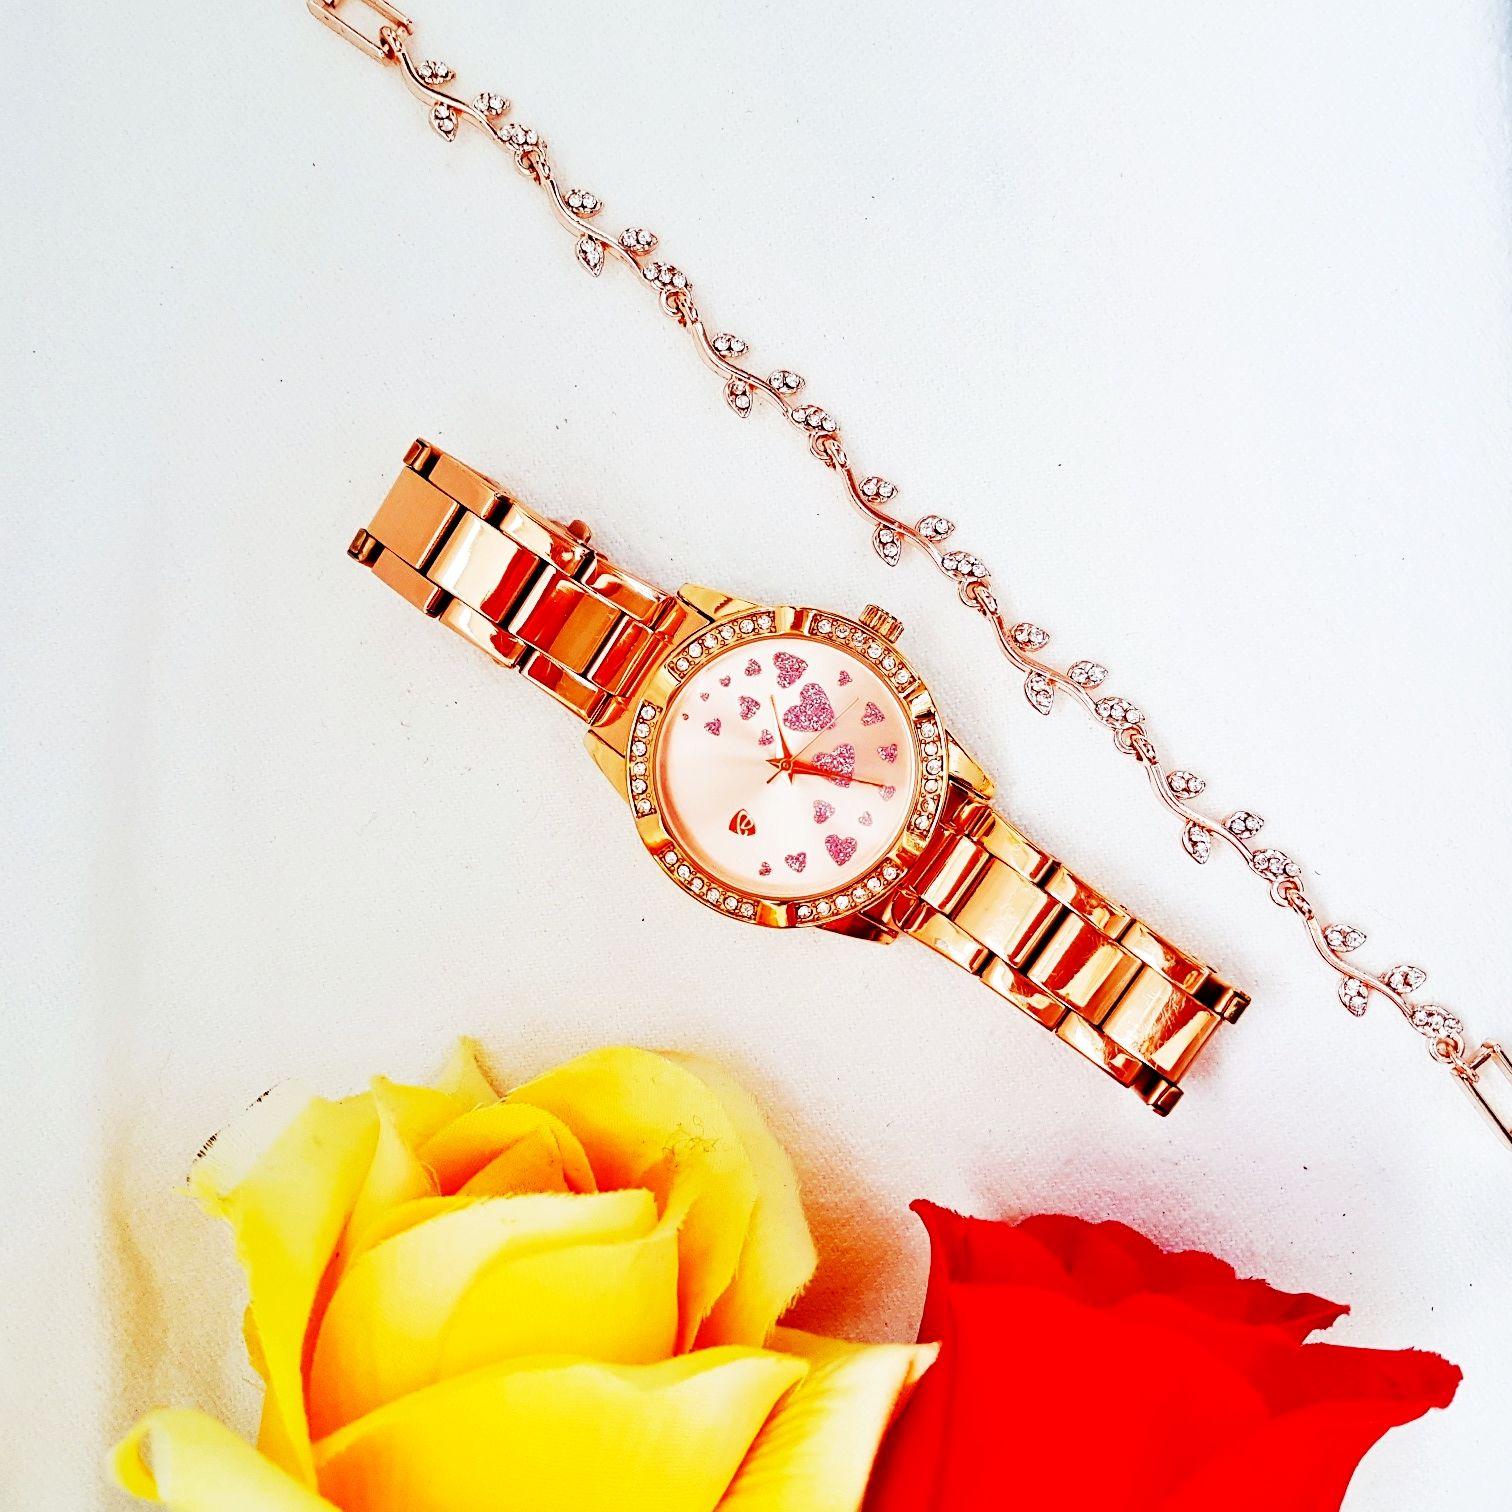 Armbanduhr von Lidl